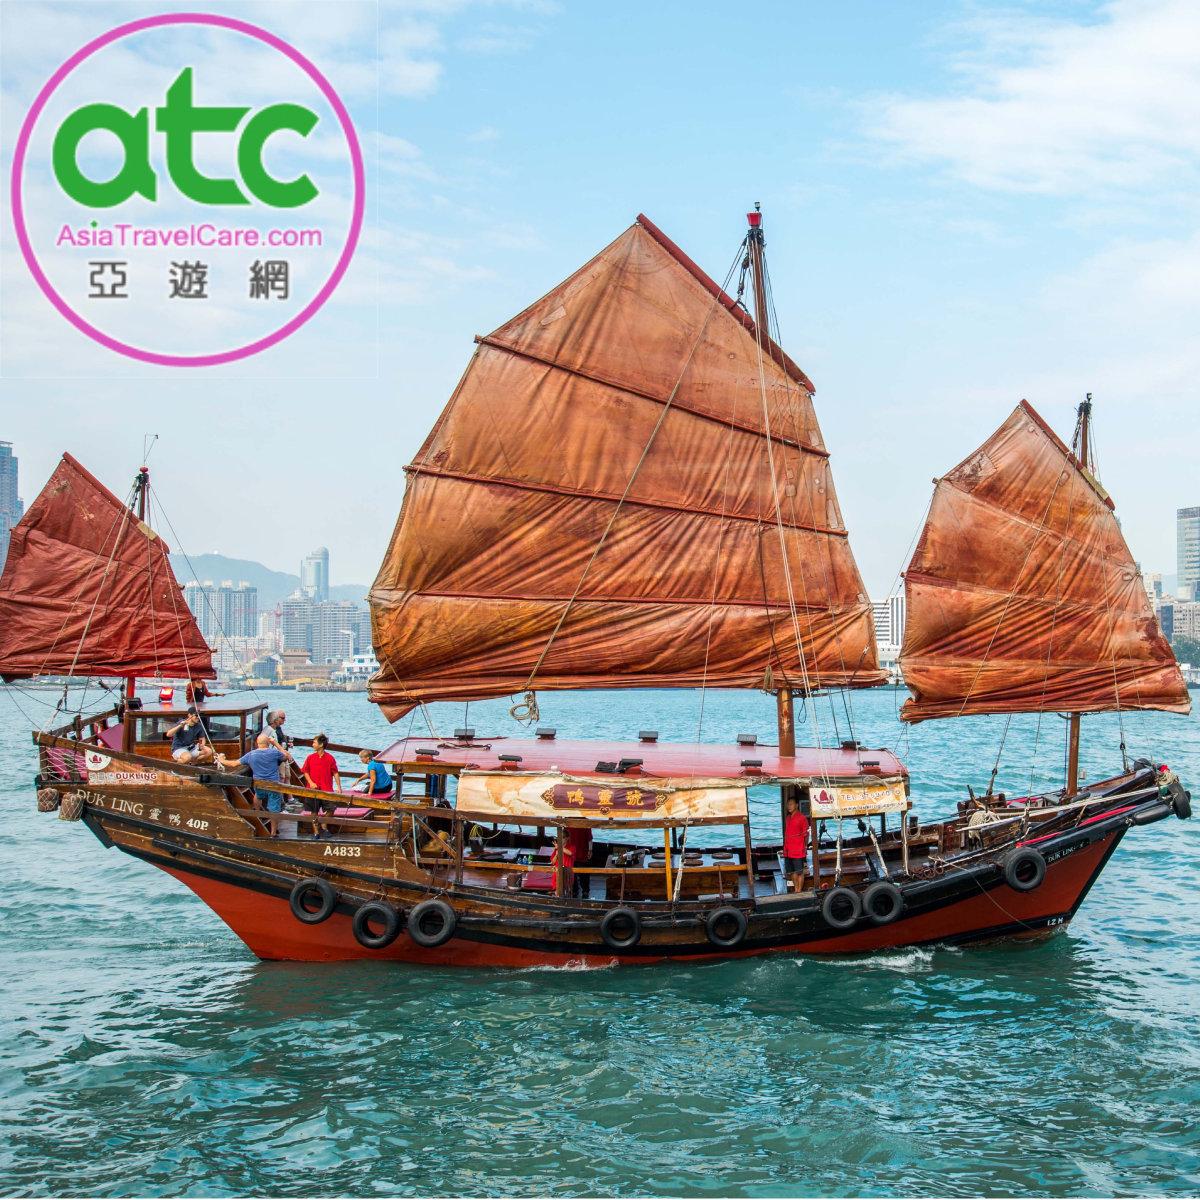 19:00 Central - 1 Pax (Adult) - Cruise Ticket (Romantic Fri)